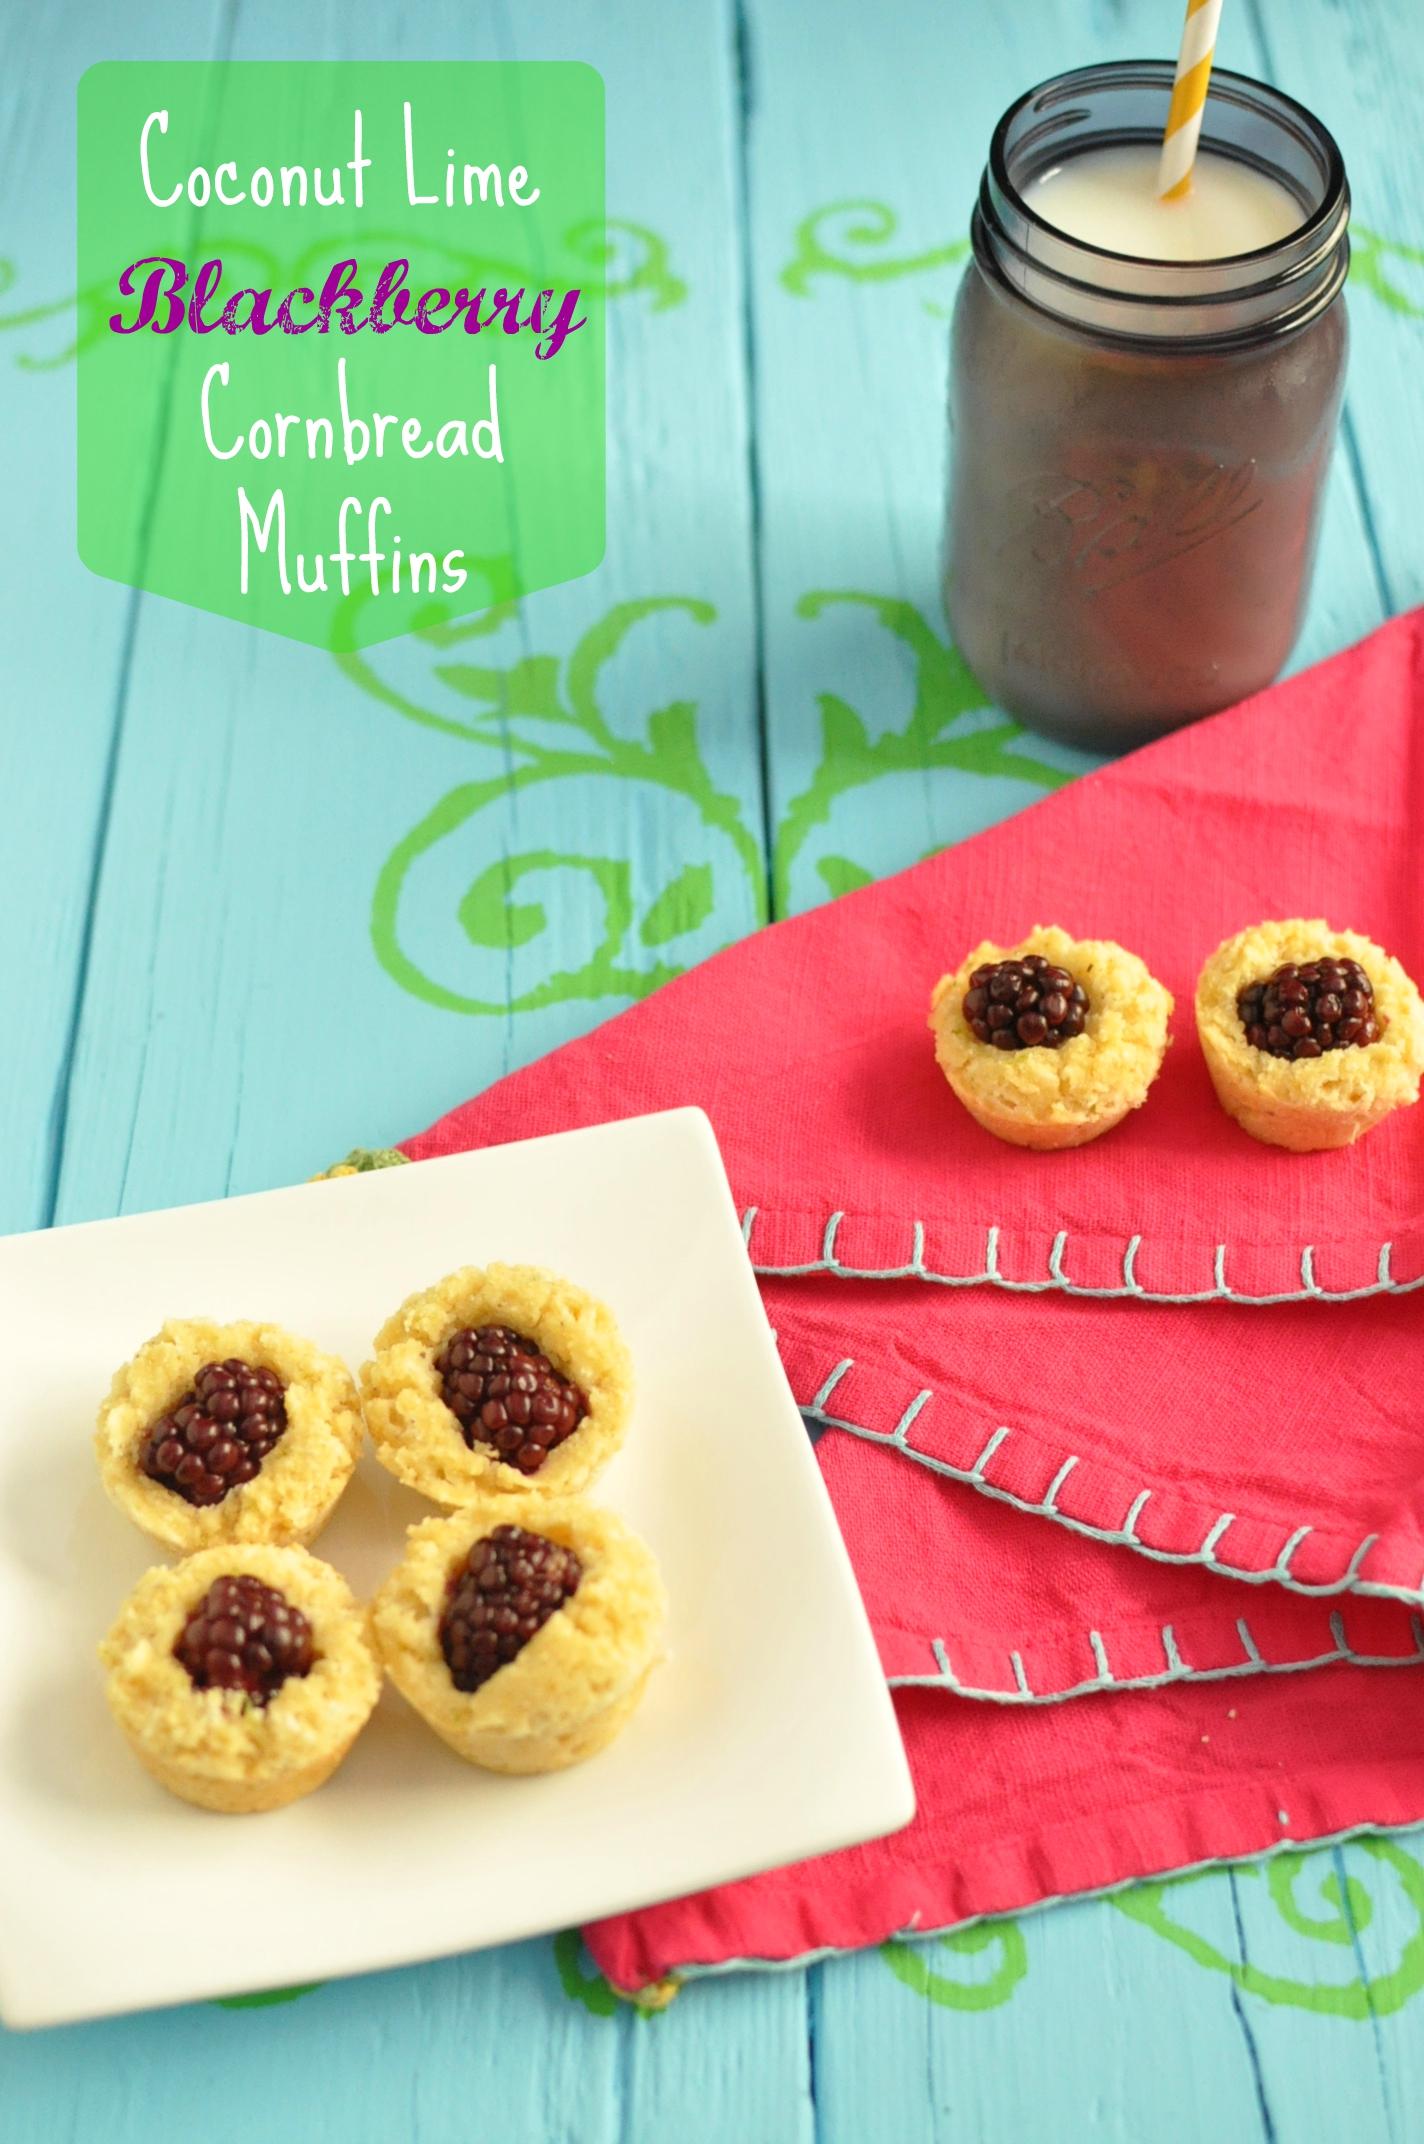 Coconut Lime Blackberry Cornbread Muffins | Feeding My 3 Sons